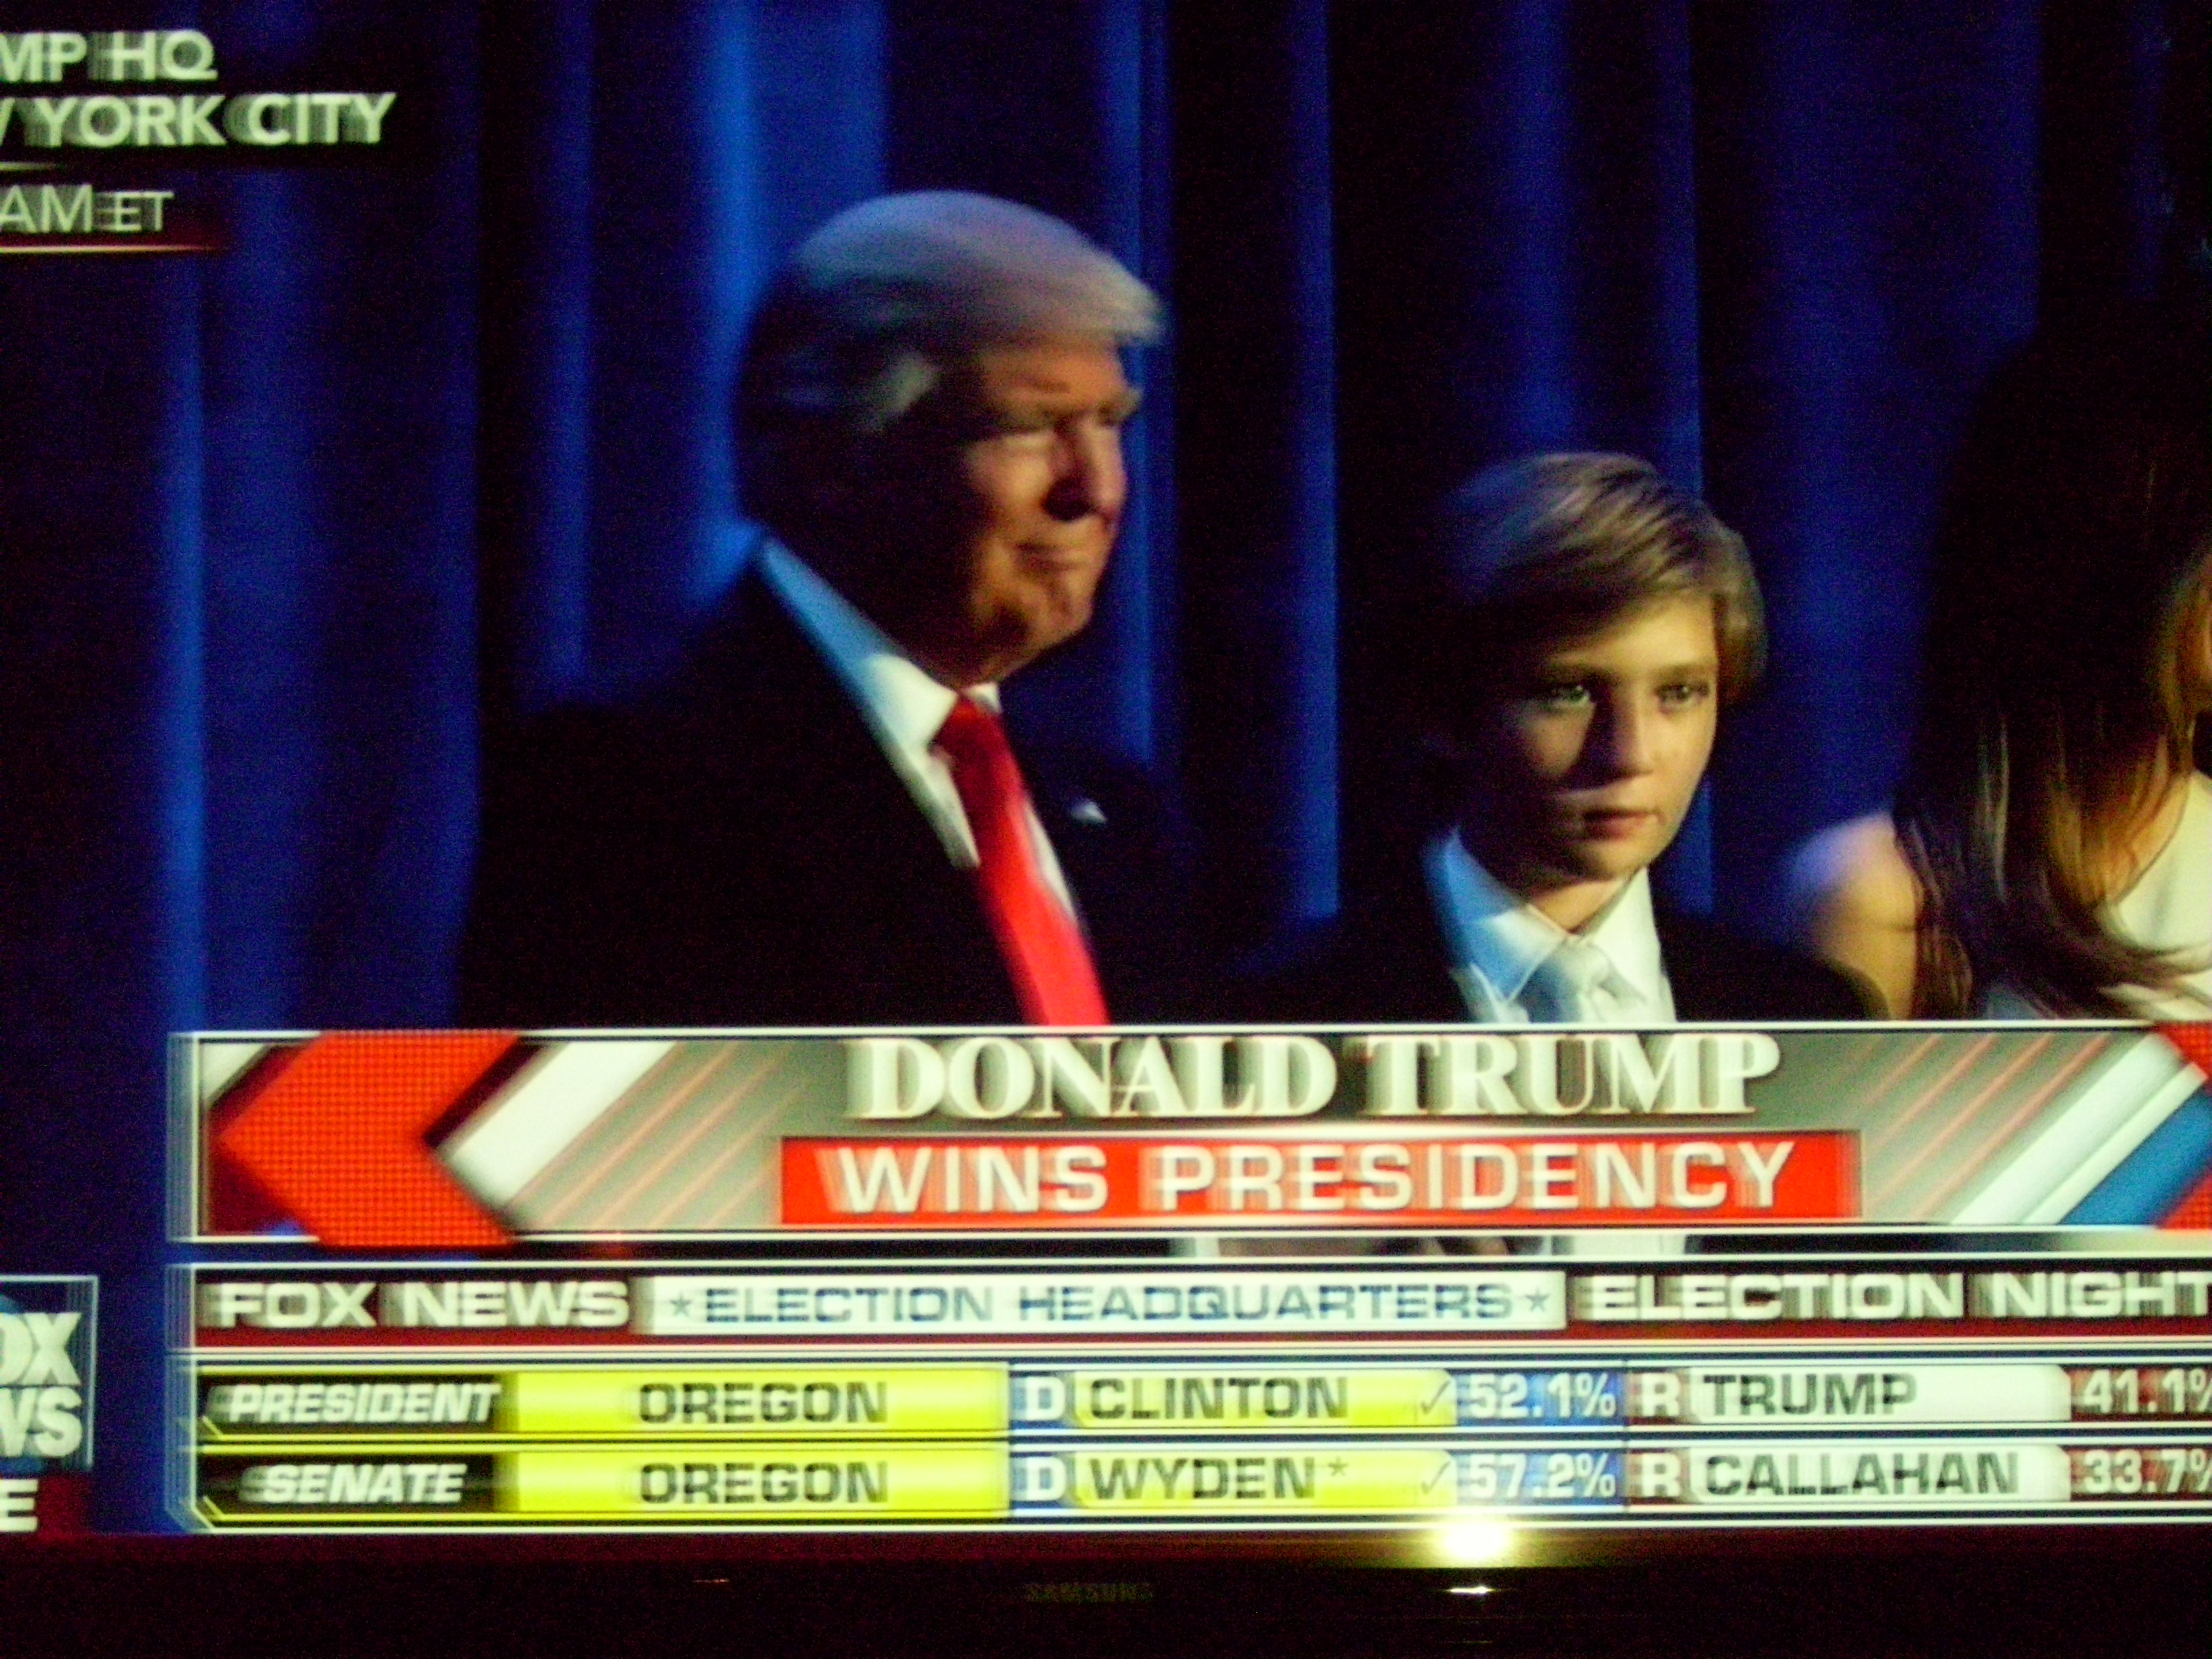 President-Elect Donald Trump wins presidency